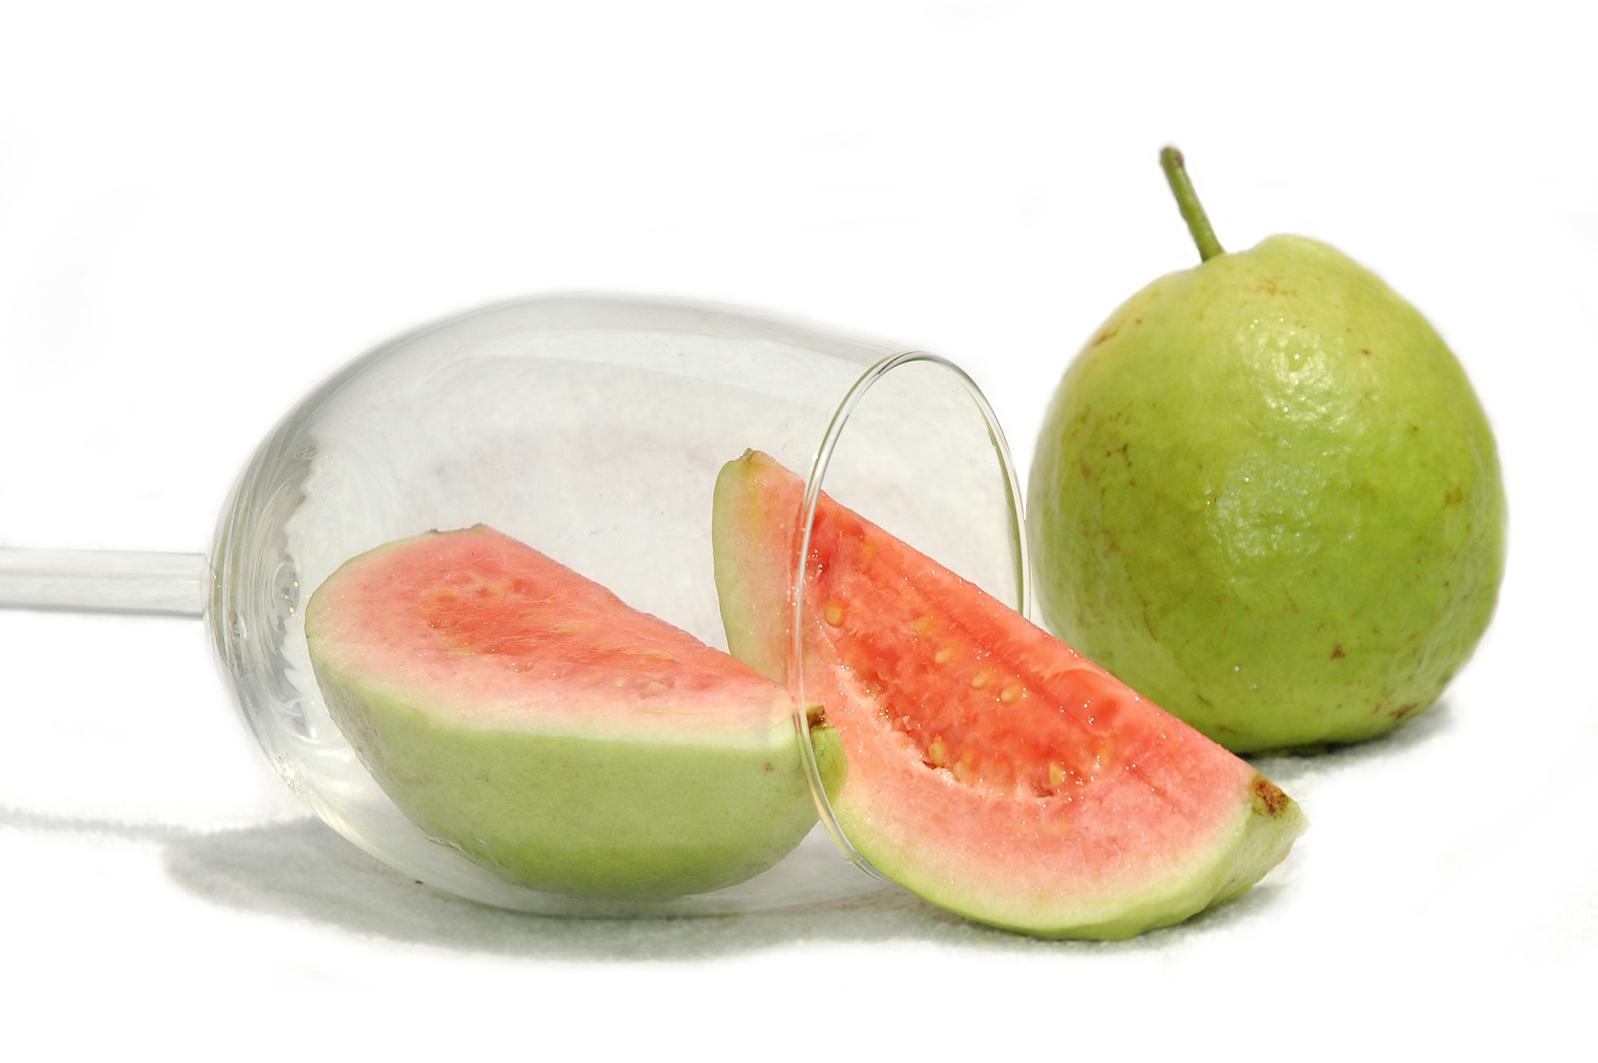 The Wondrous Guava Superfruit